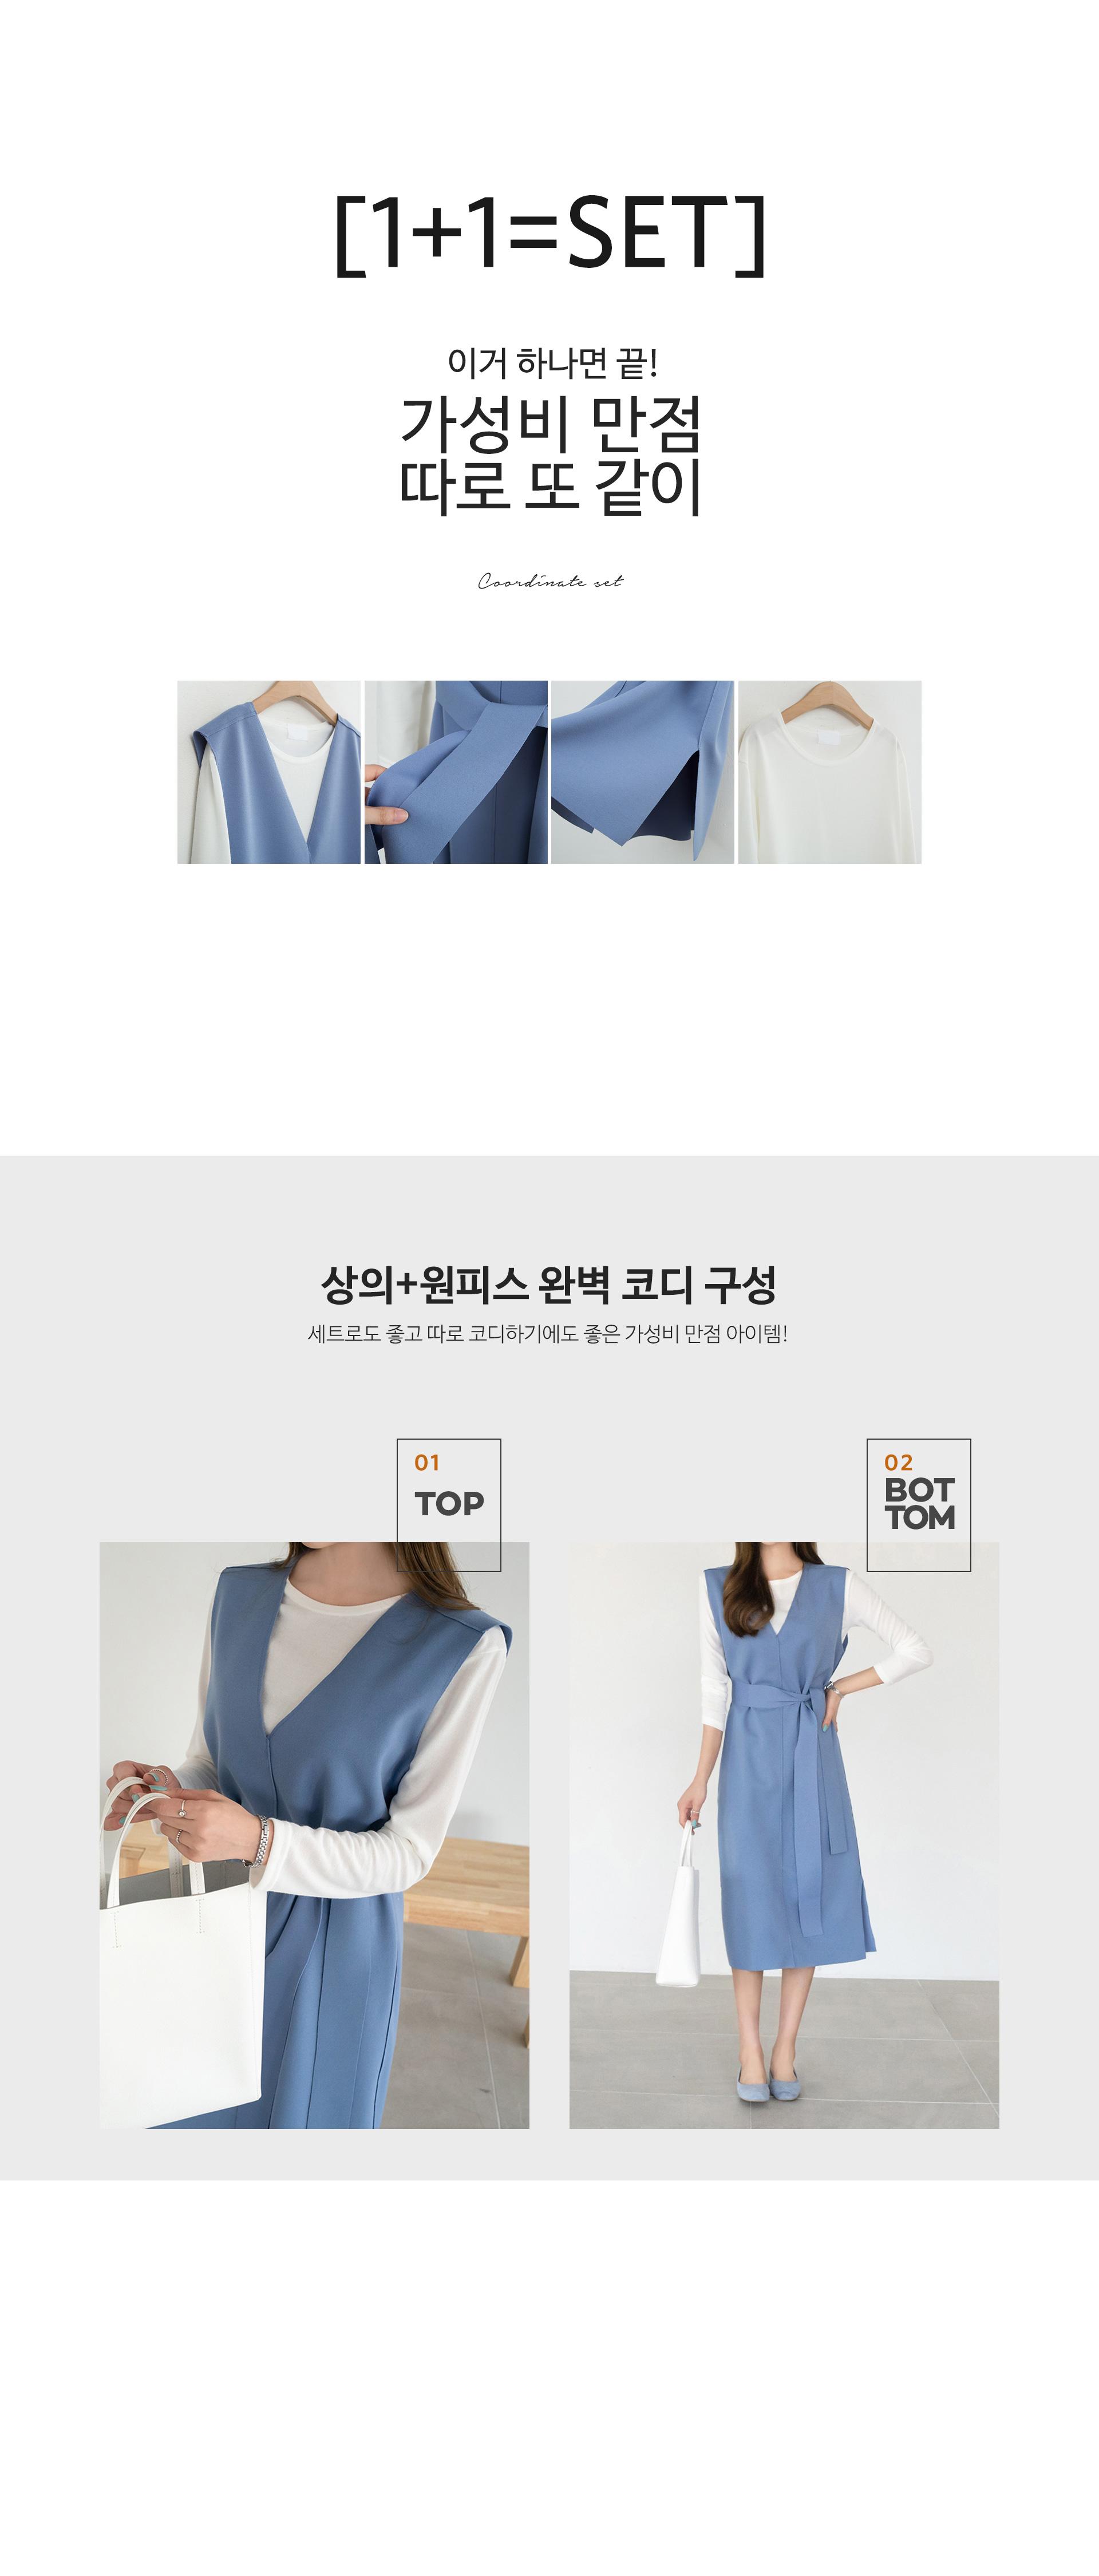 V-neck waistband dress set #35875★28%) Pretty! T-shirt + One Piece SET!★